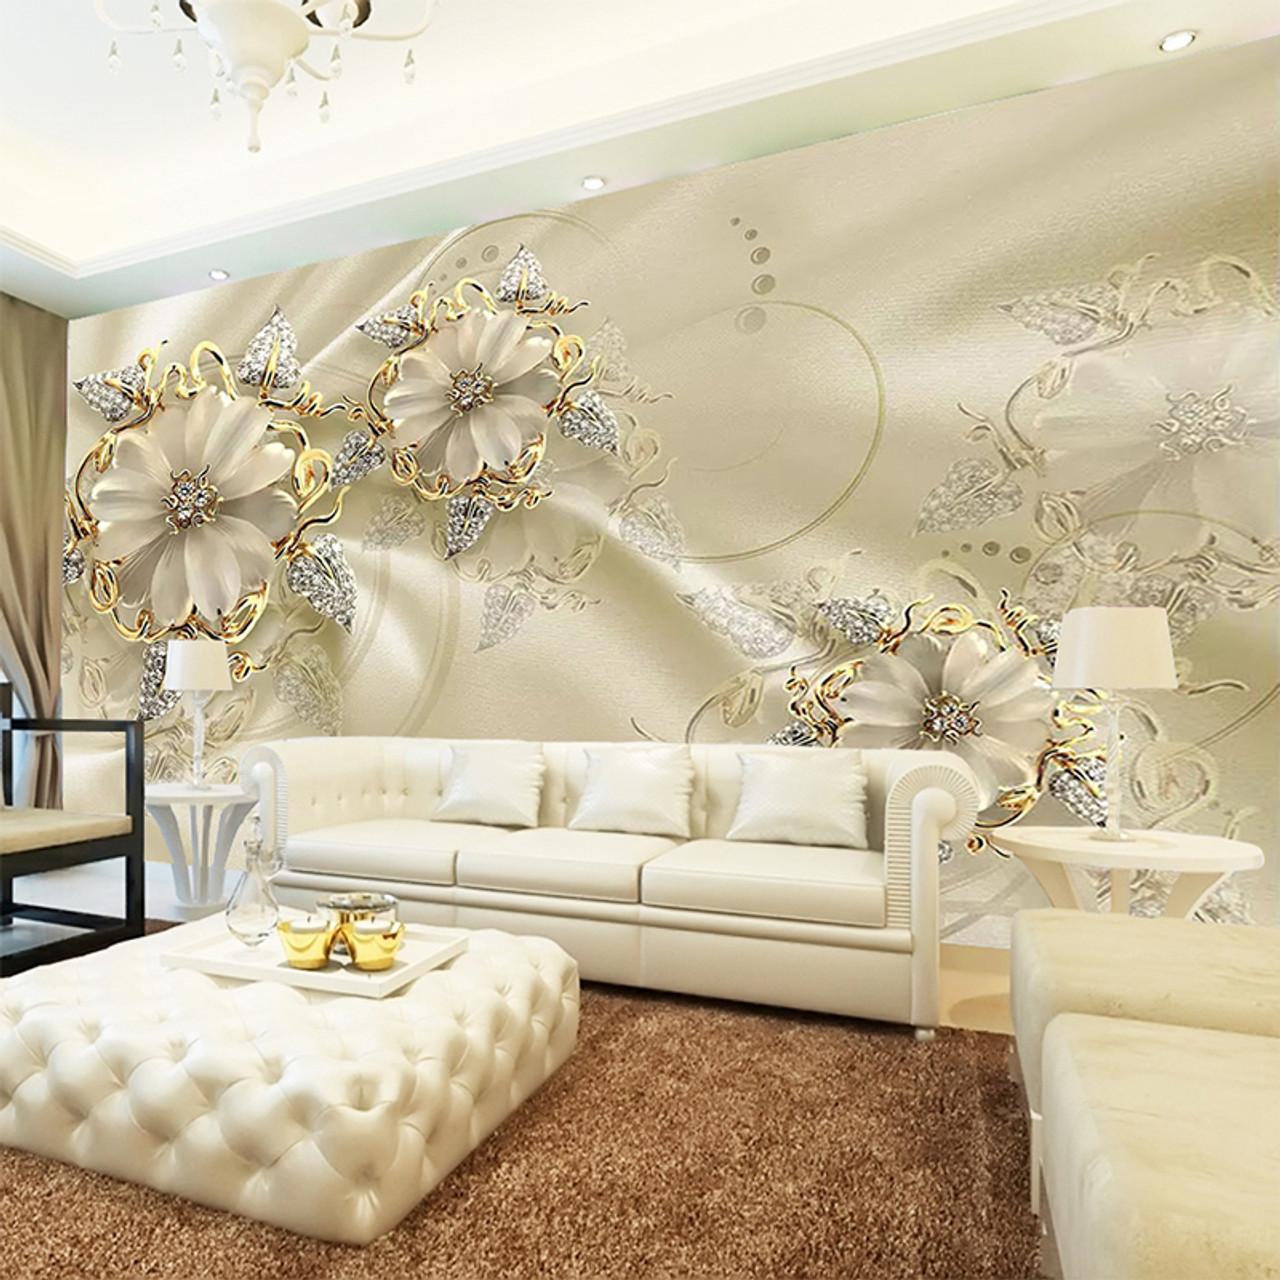 Custom 3d Mural Wallpaper European Style Diamond Jewelry Golden